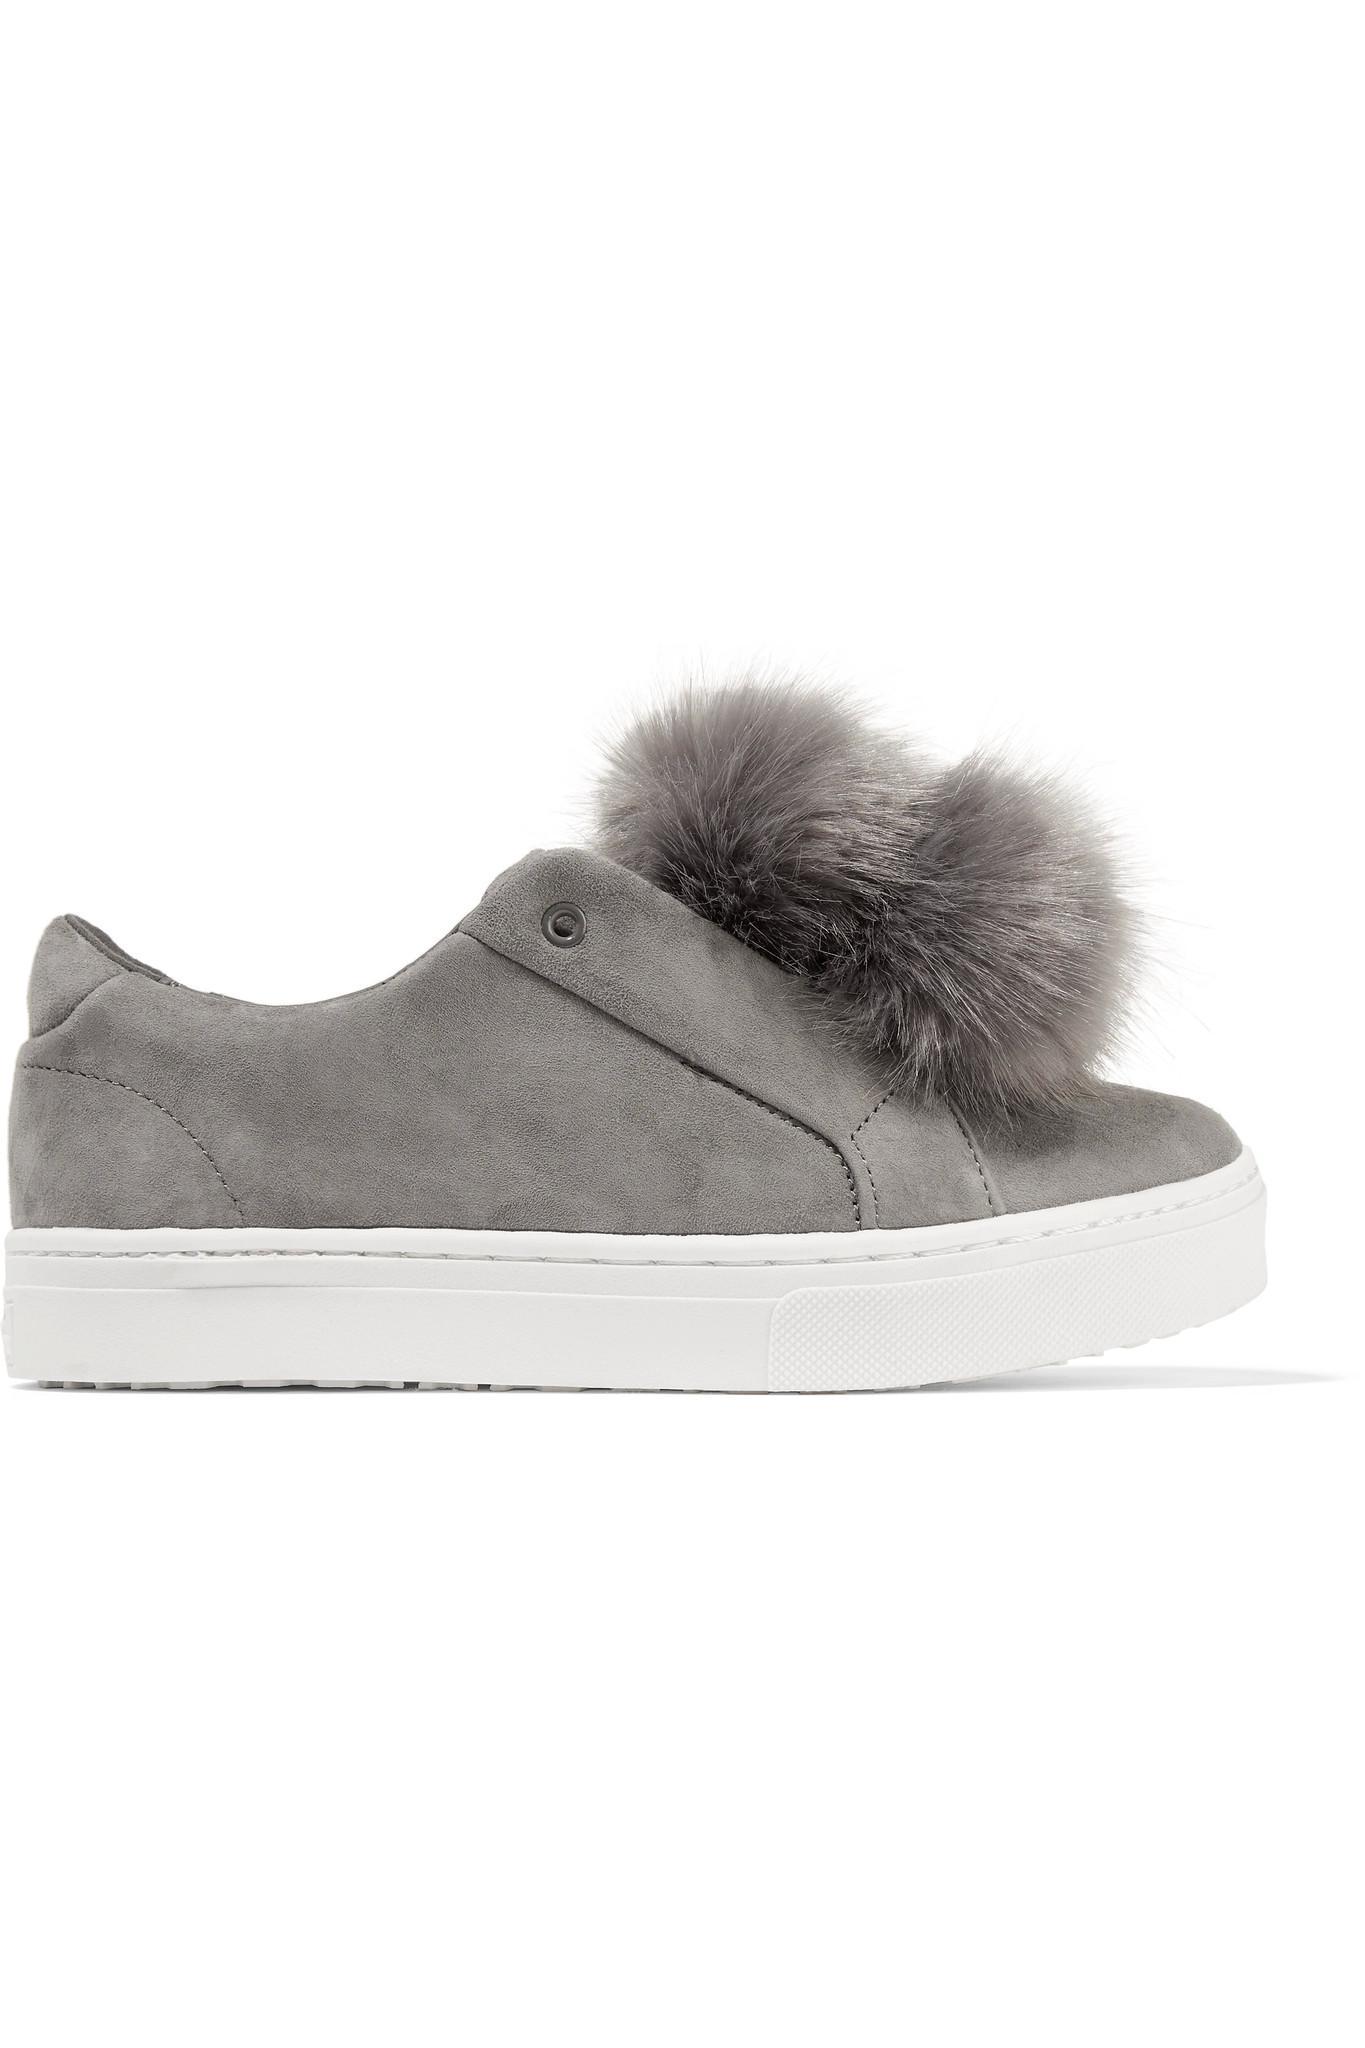 db2e4735640d Lyst - Sam Edelman Leya Faux Fur-embellished Suede Slip-on Sneakers ...